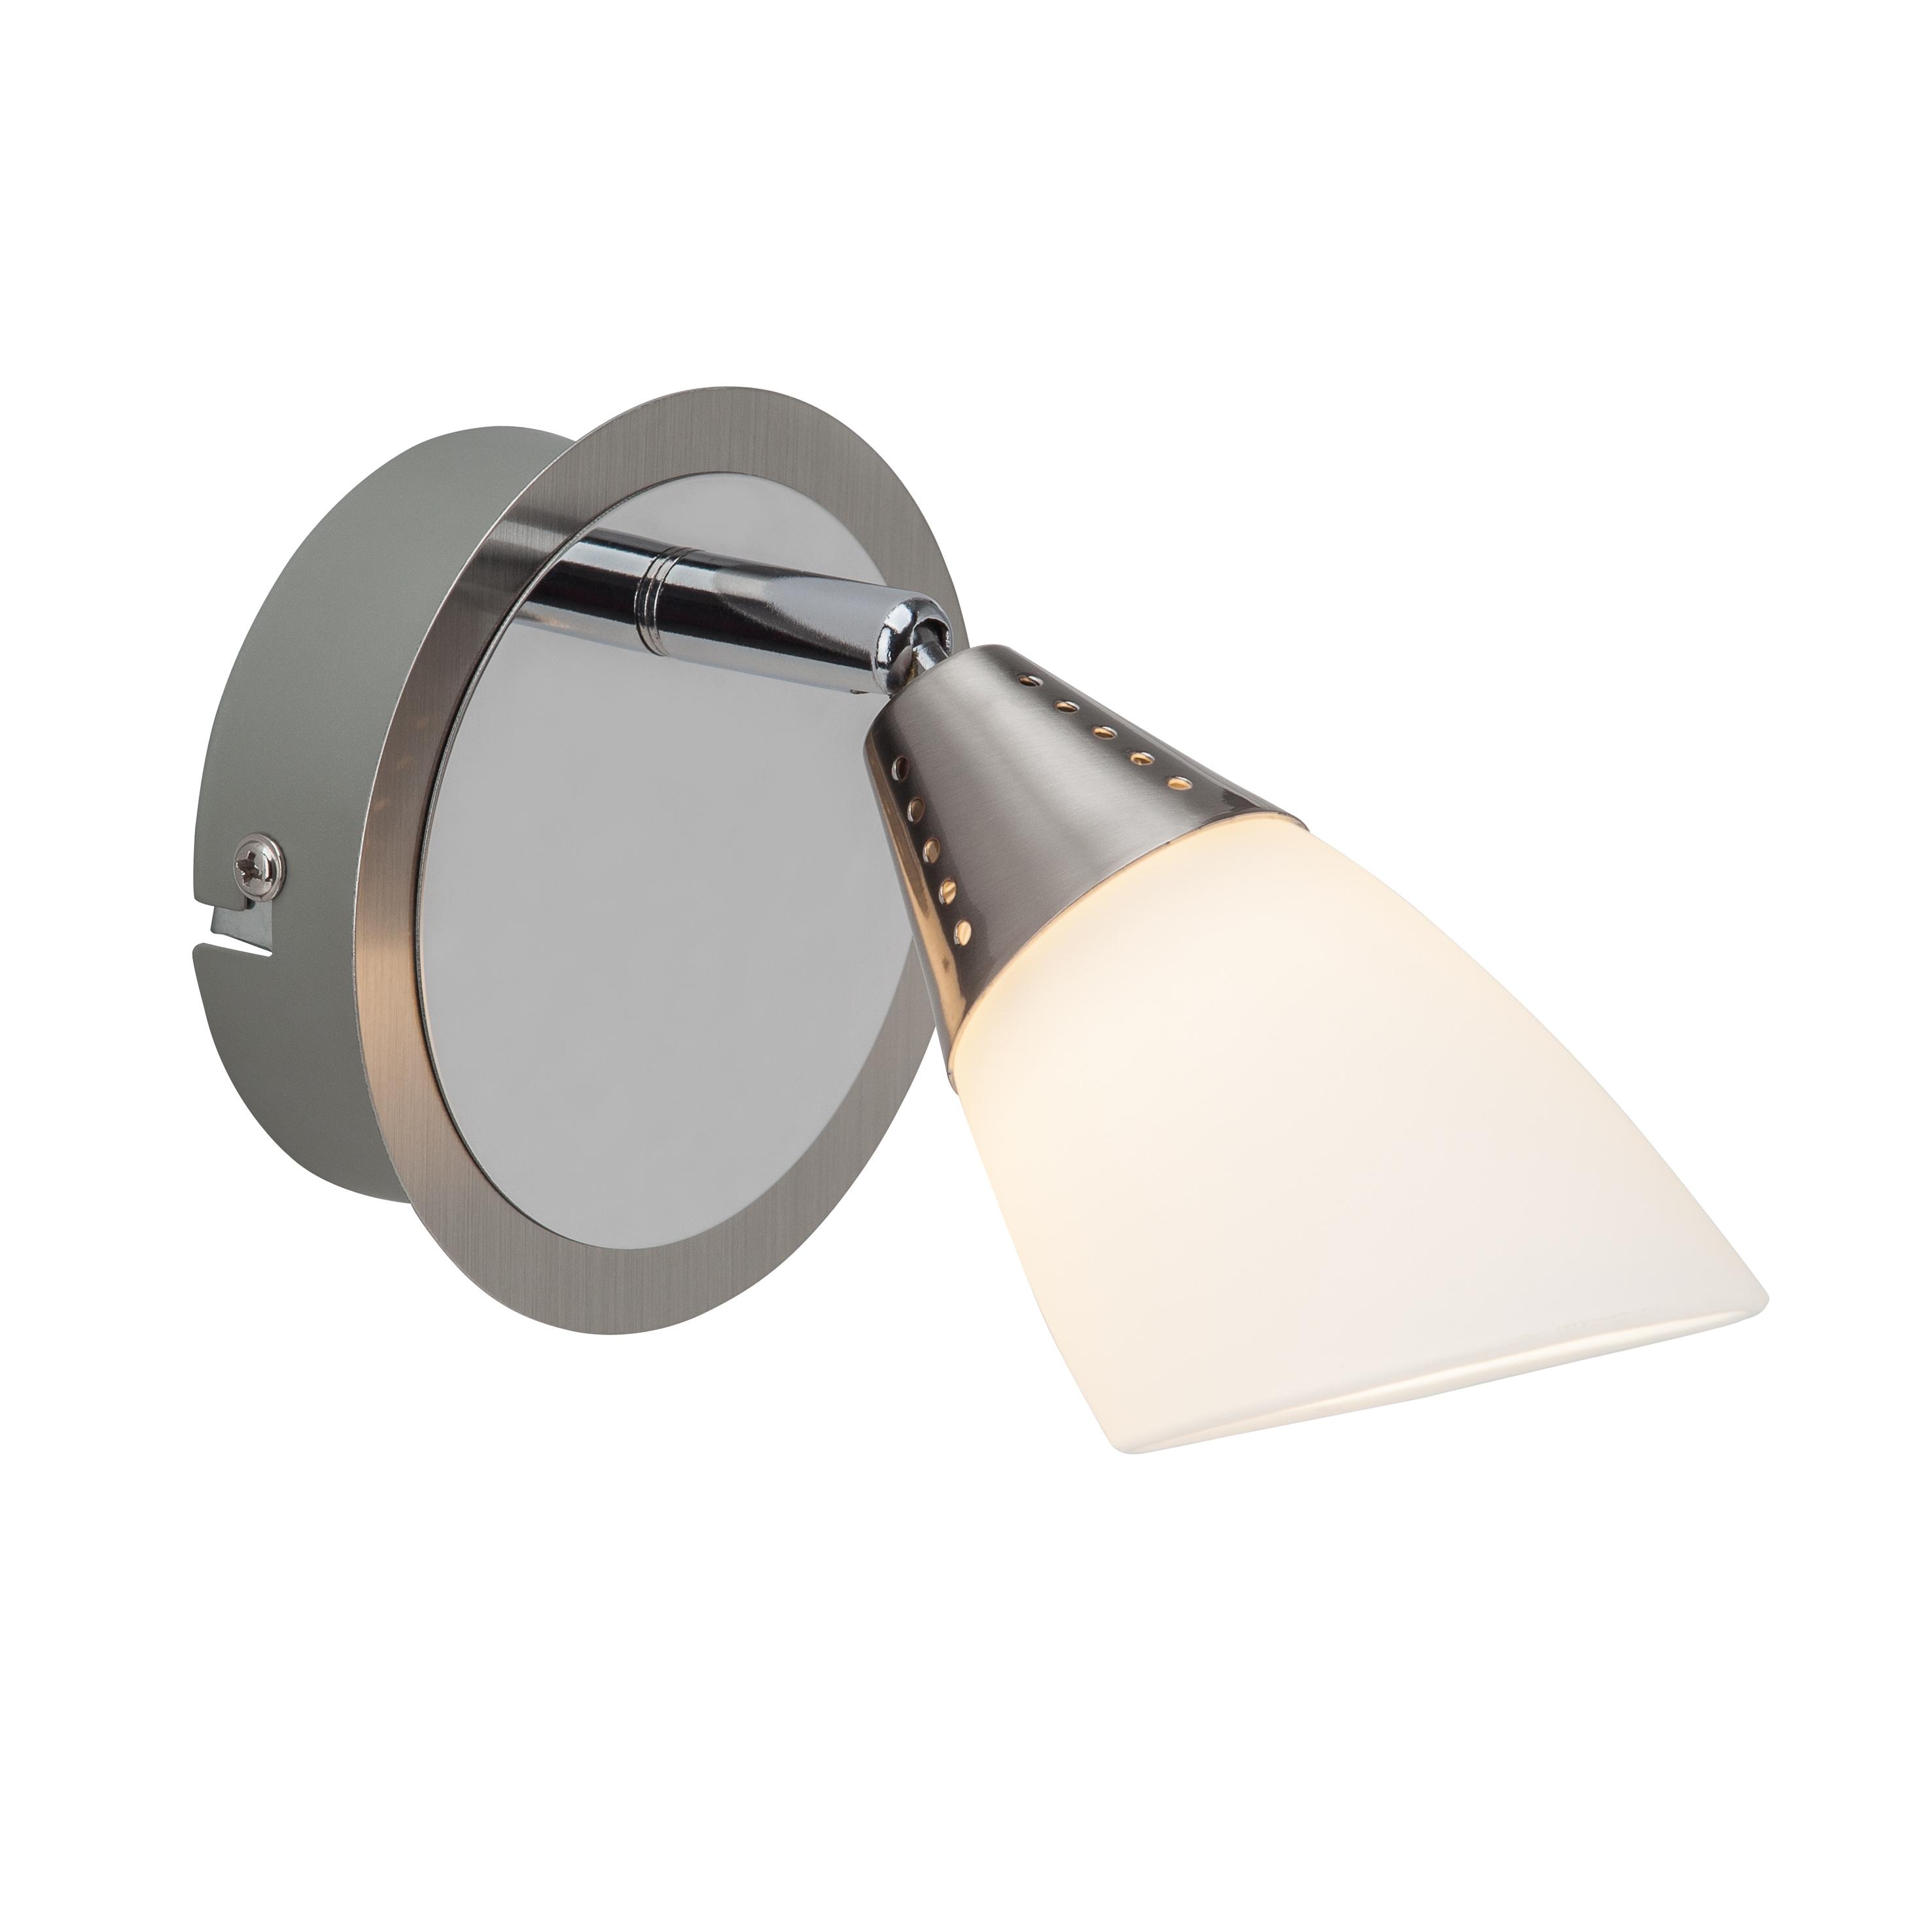 Brilliant Leuchten Opalina LED Wandspot eisen chrom/weiß